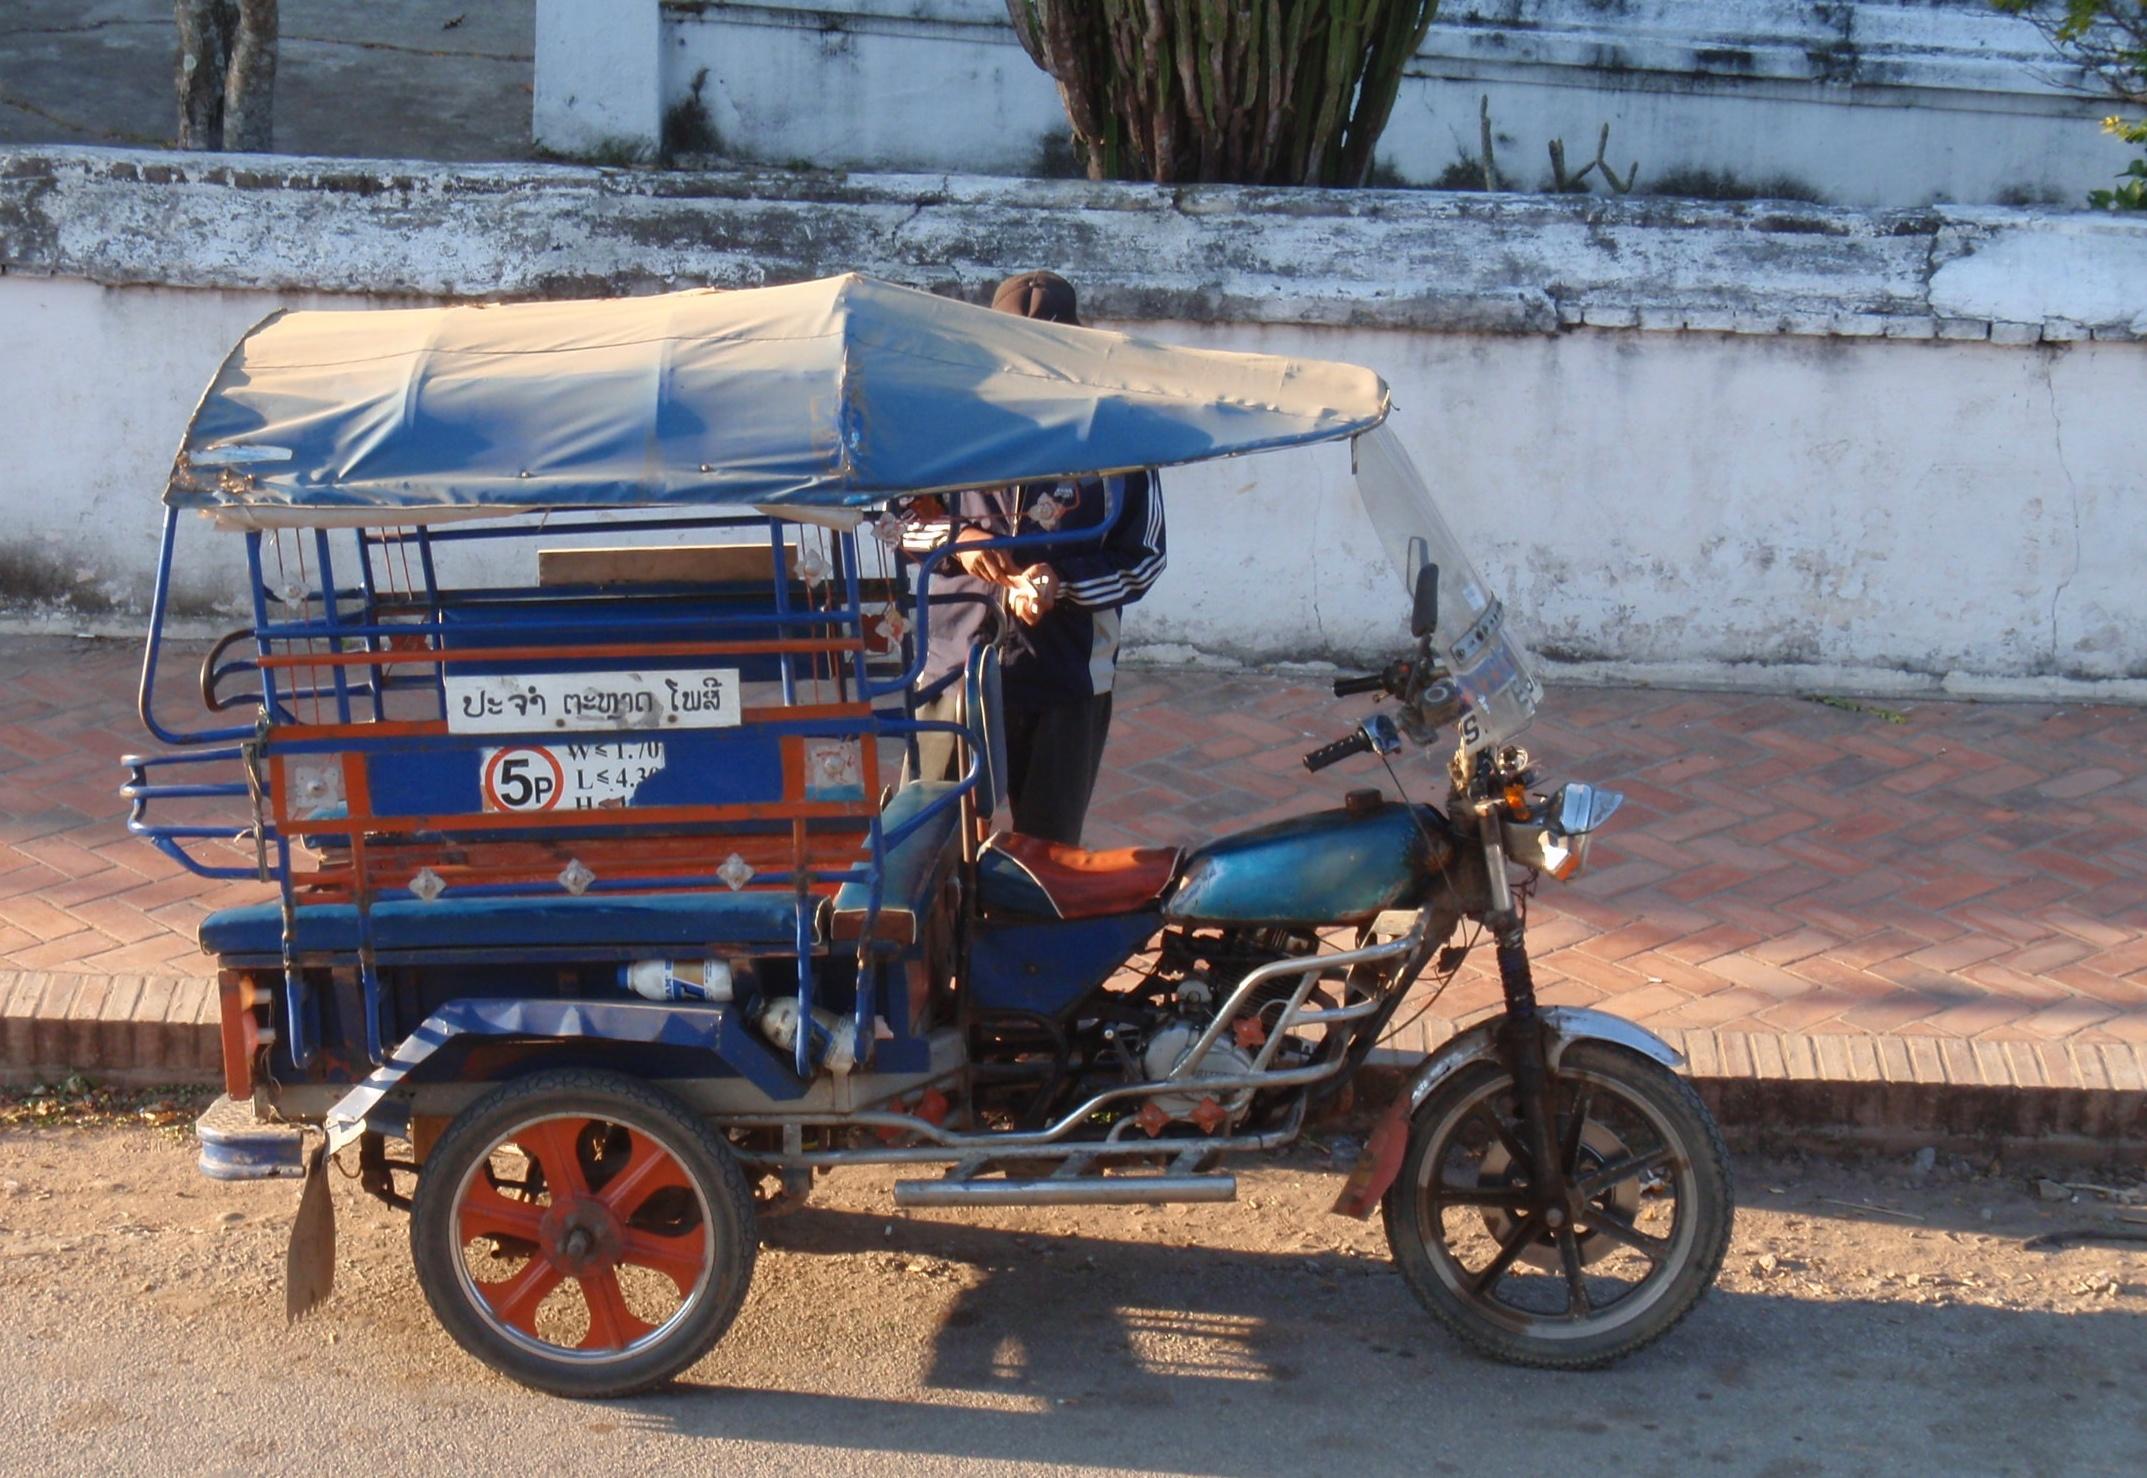 File:Laos motorcycle modified into tuk tuk auto rickshaw.jpg ...